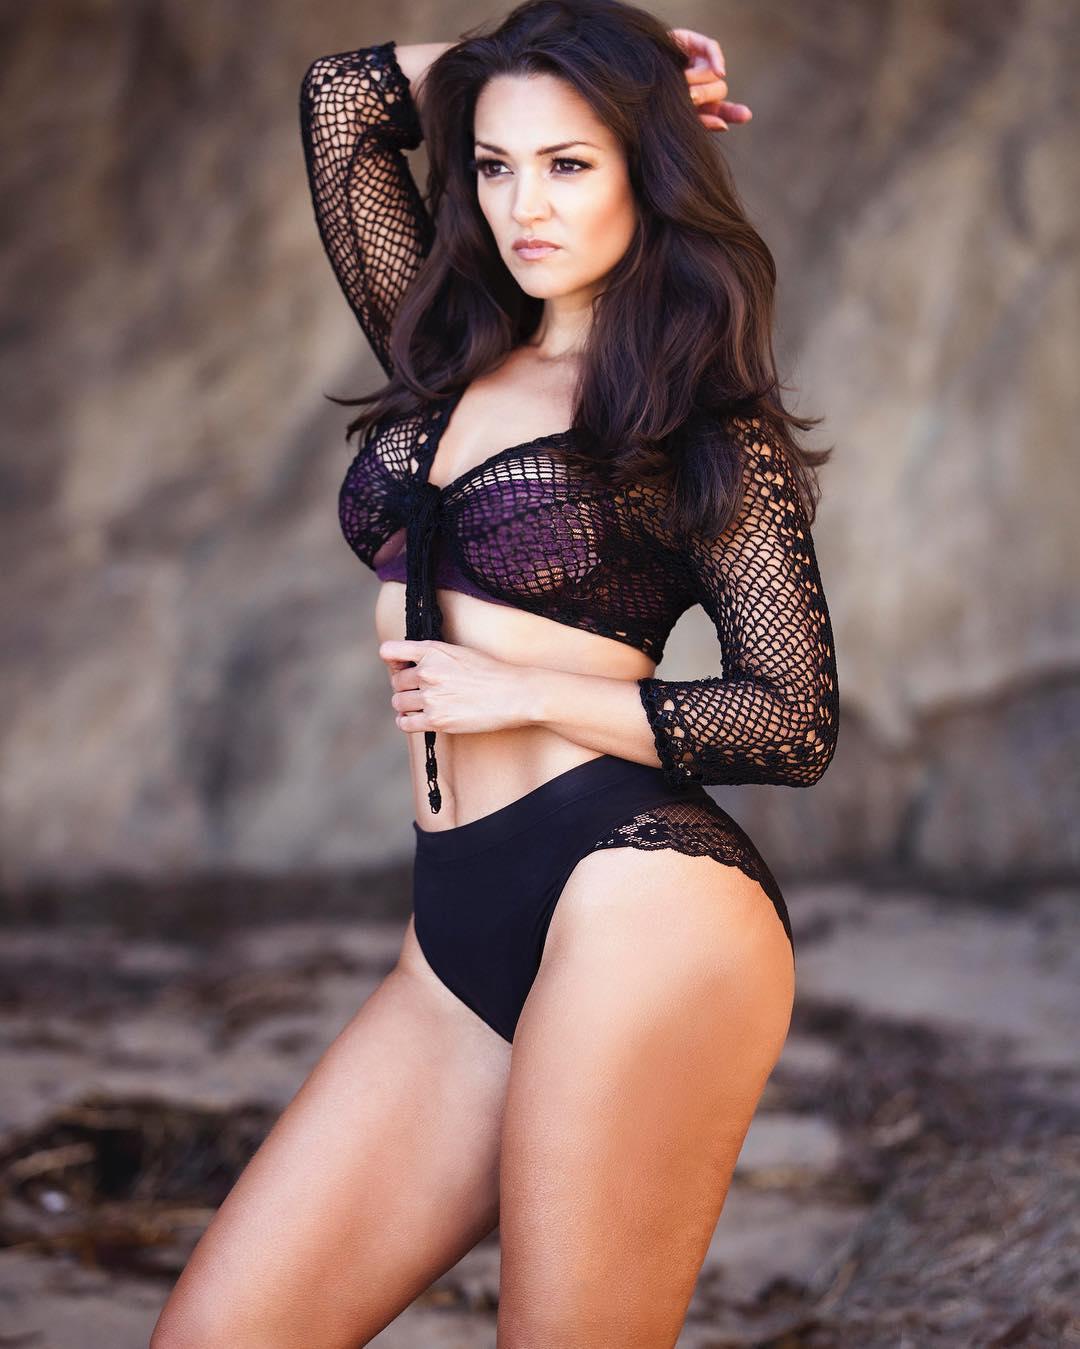 Ana Lucia Dominguez Nude paula garces upskirt » micact.eu